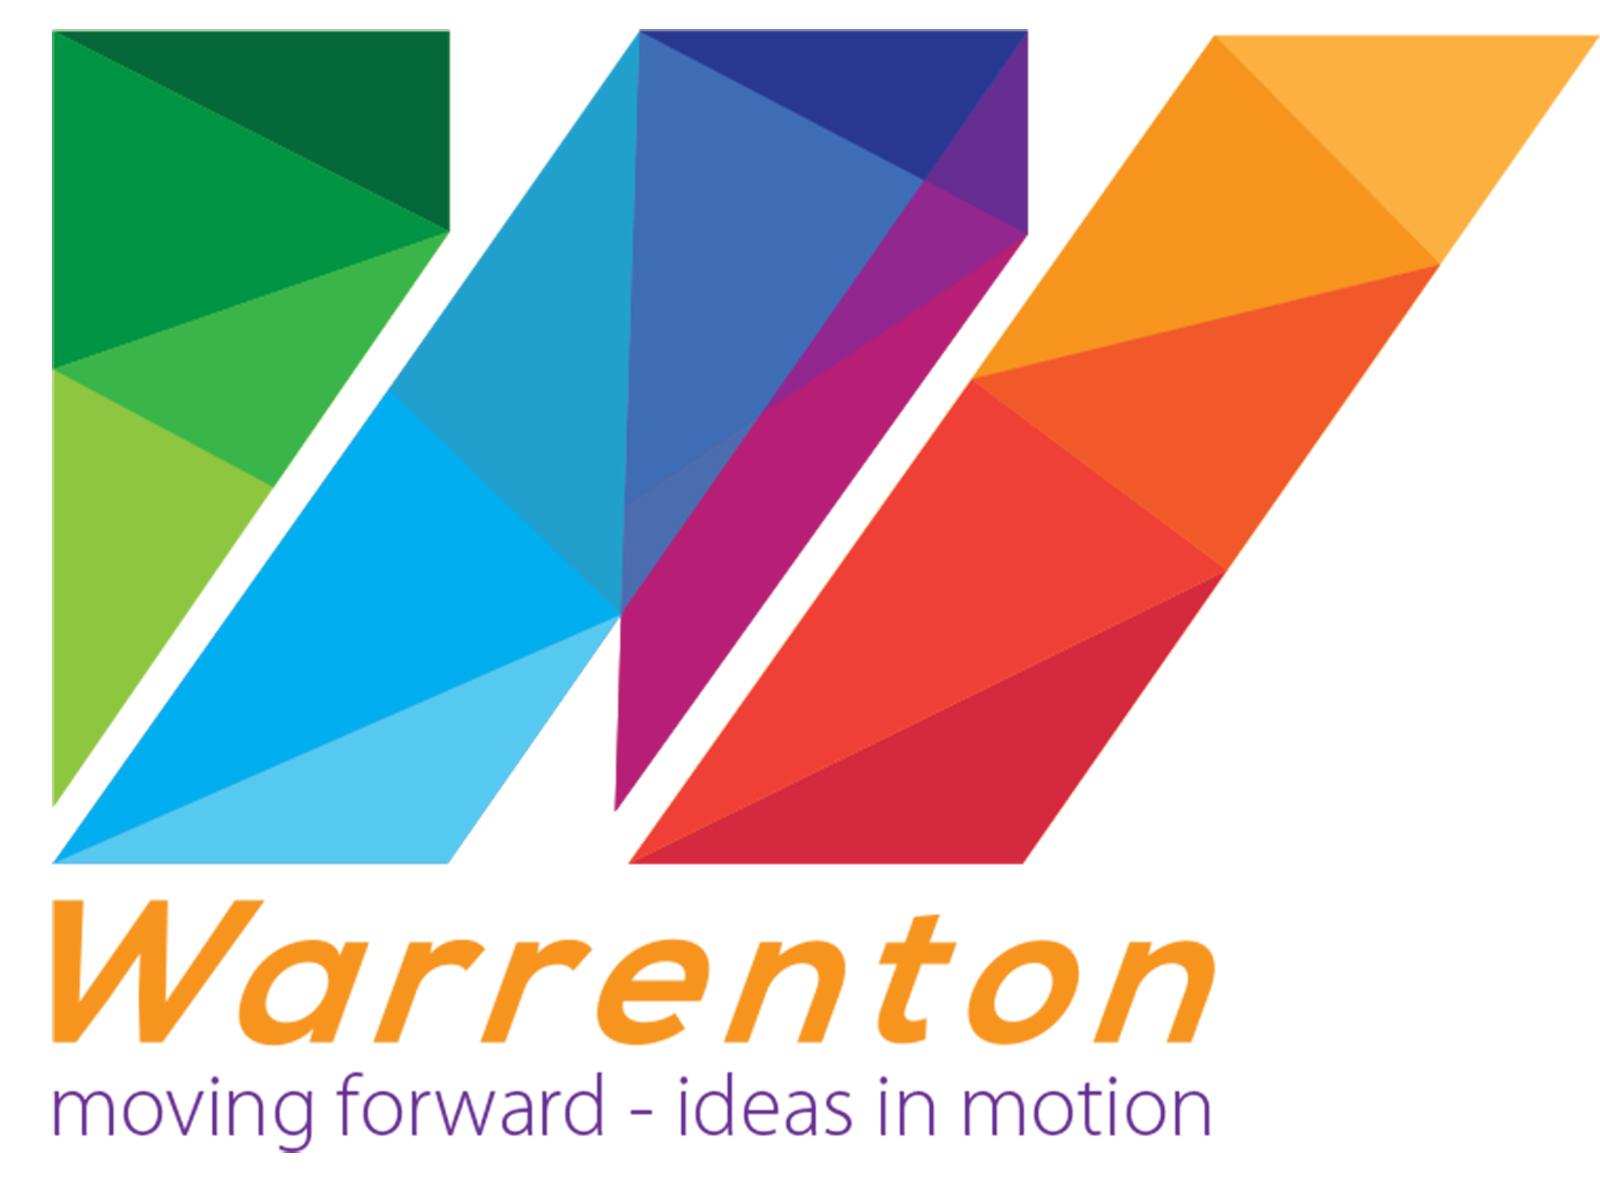 Warrenton brand2.jpg